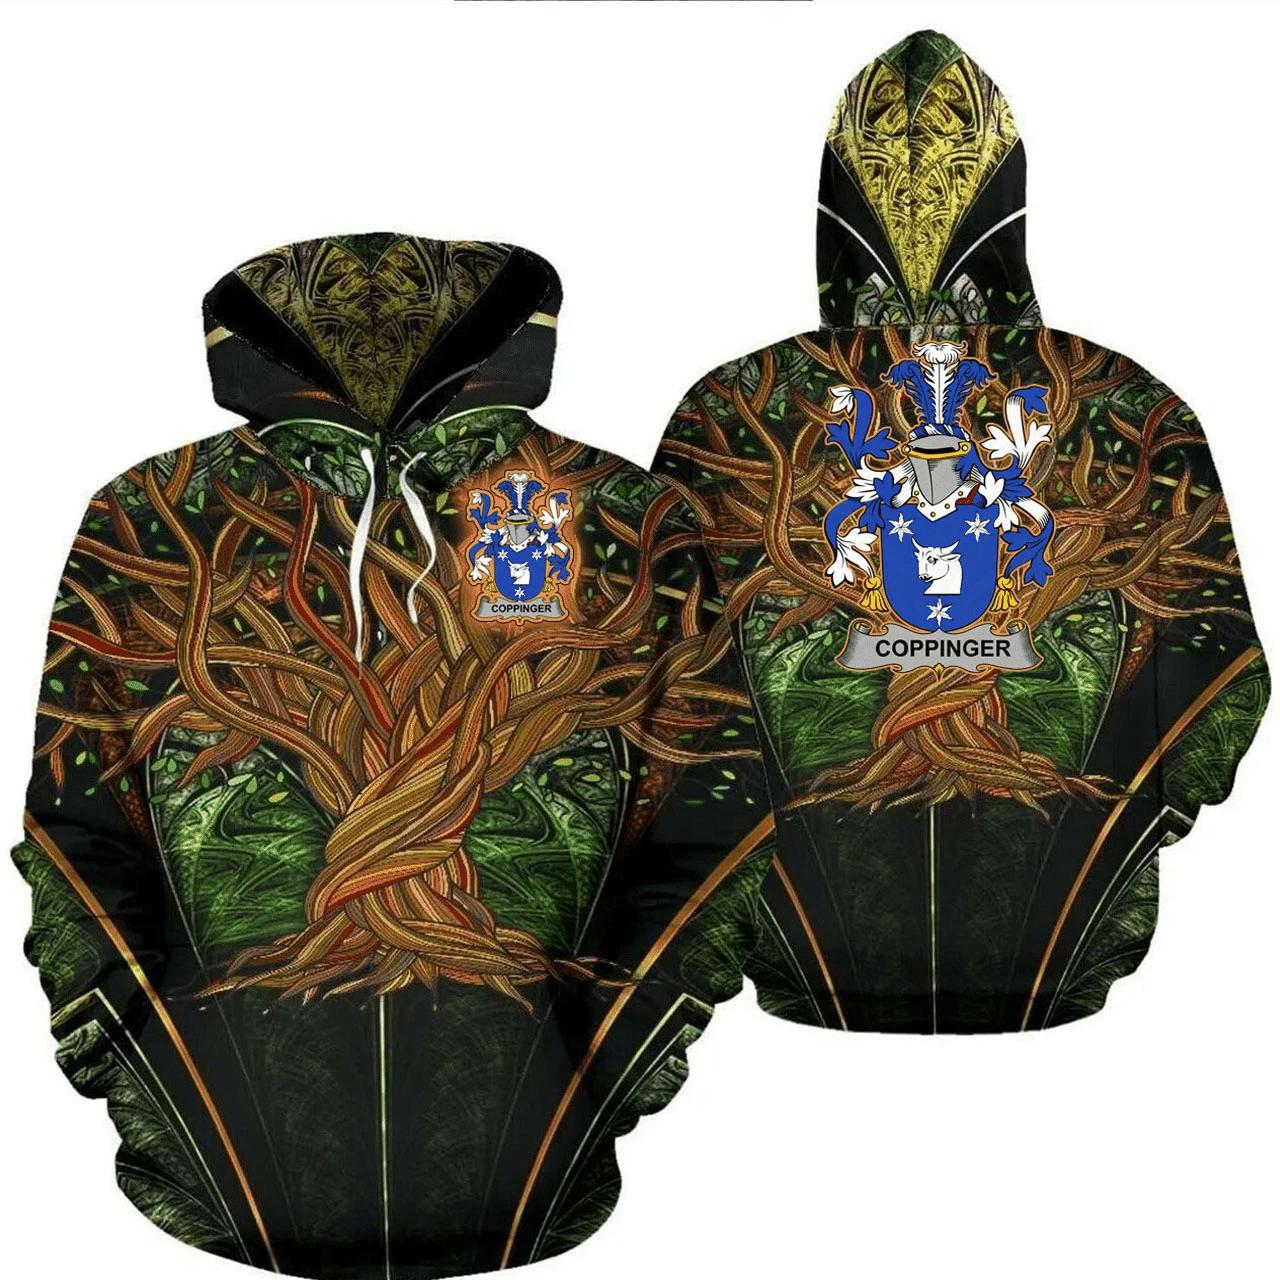 1stIreland Ireland Hoodie - Coppinger Irish Family Crest Hoodie - Tree Of Life A7